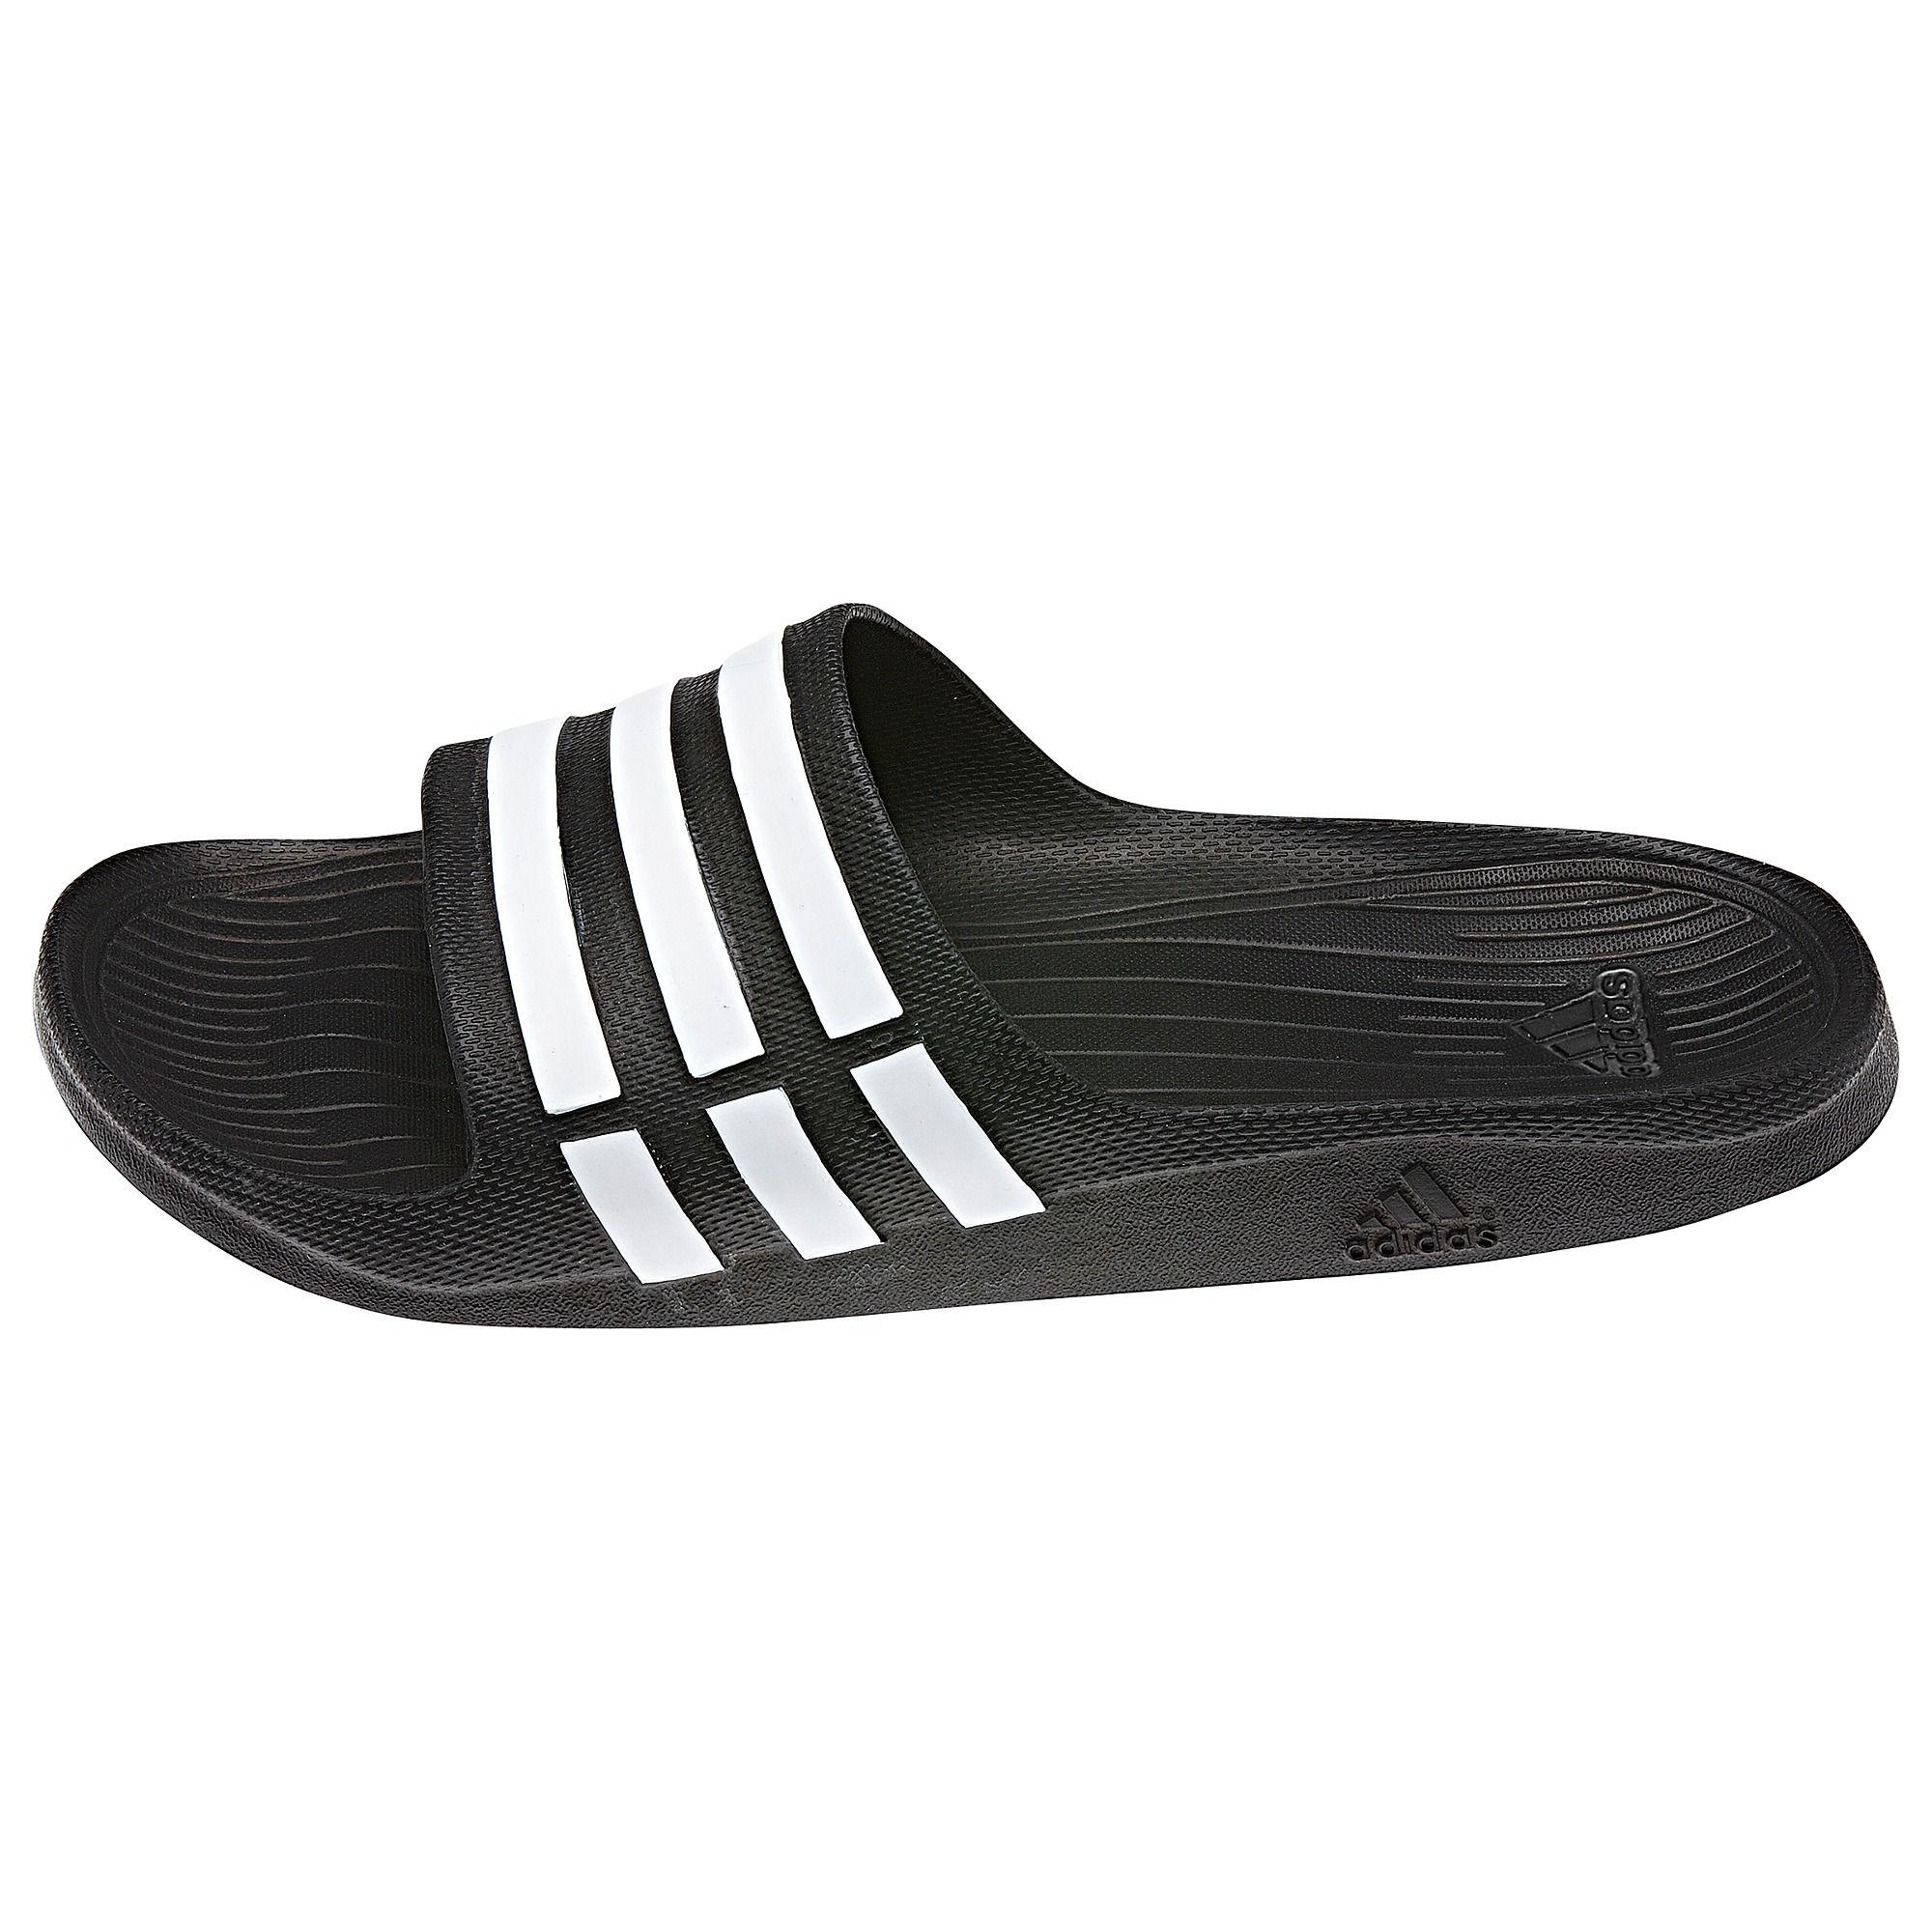 сланцы Adidas  Logo G15890 сланцы adidas duramo g15890 nike 343880 090